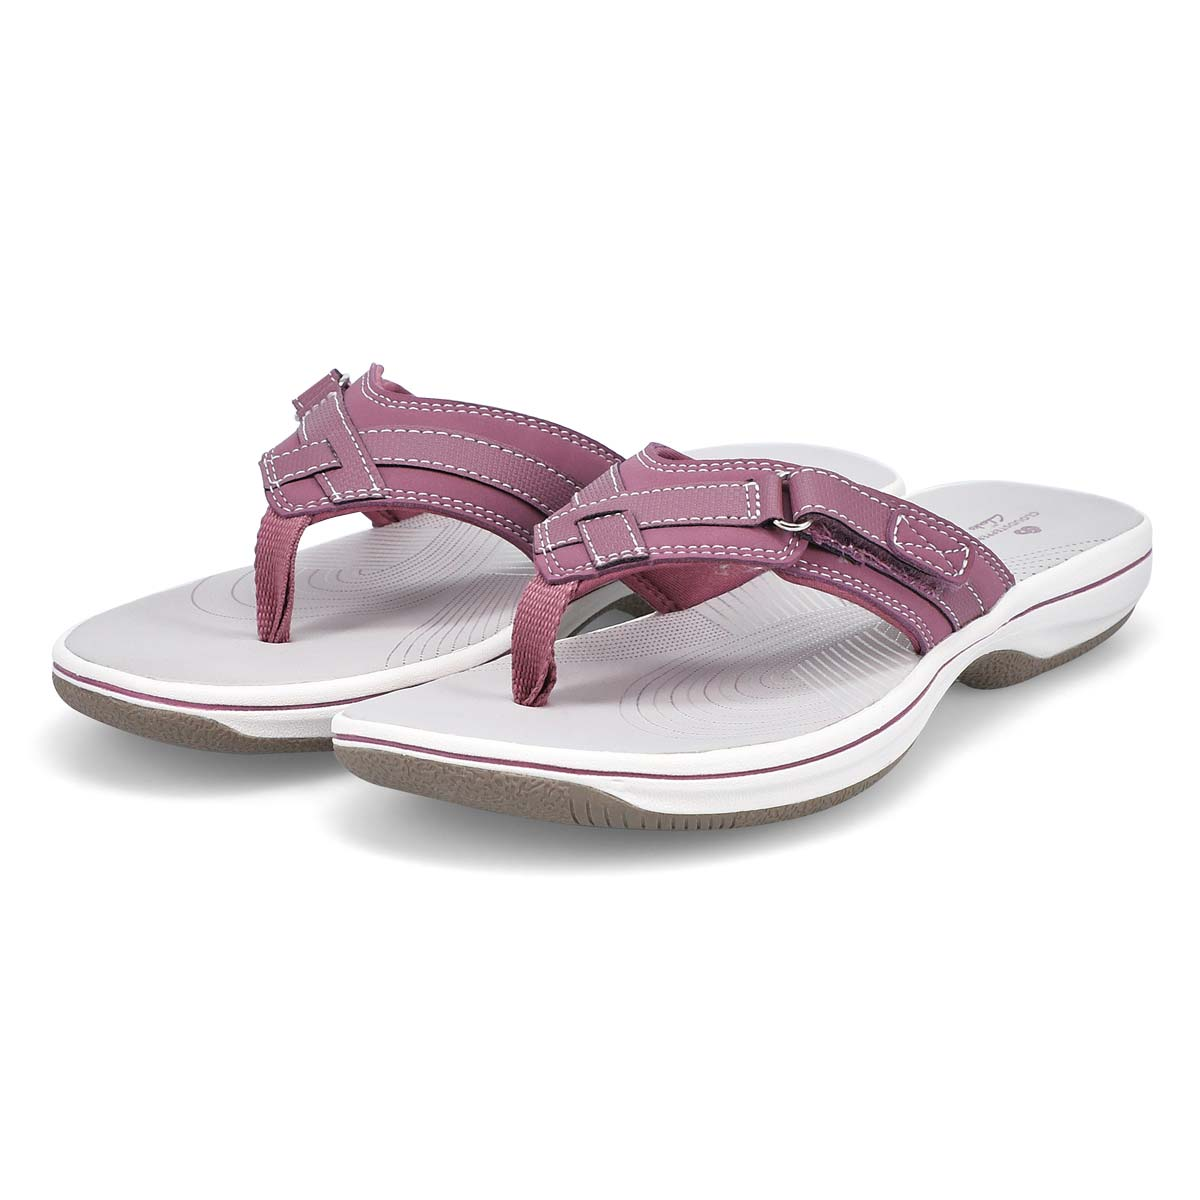 Women's Breeze Sea Thong Sandal -Purple